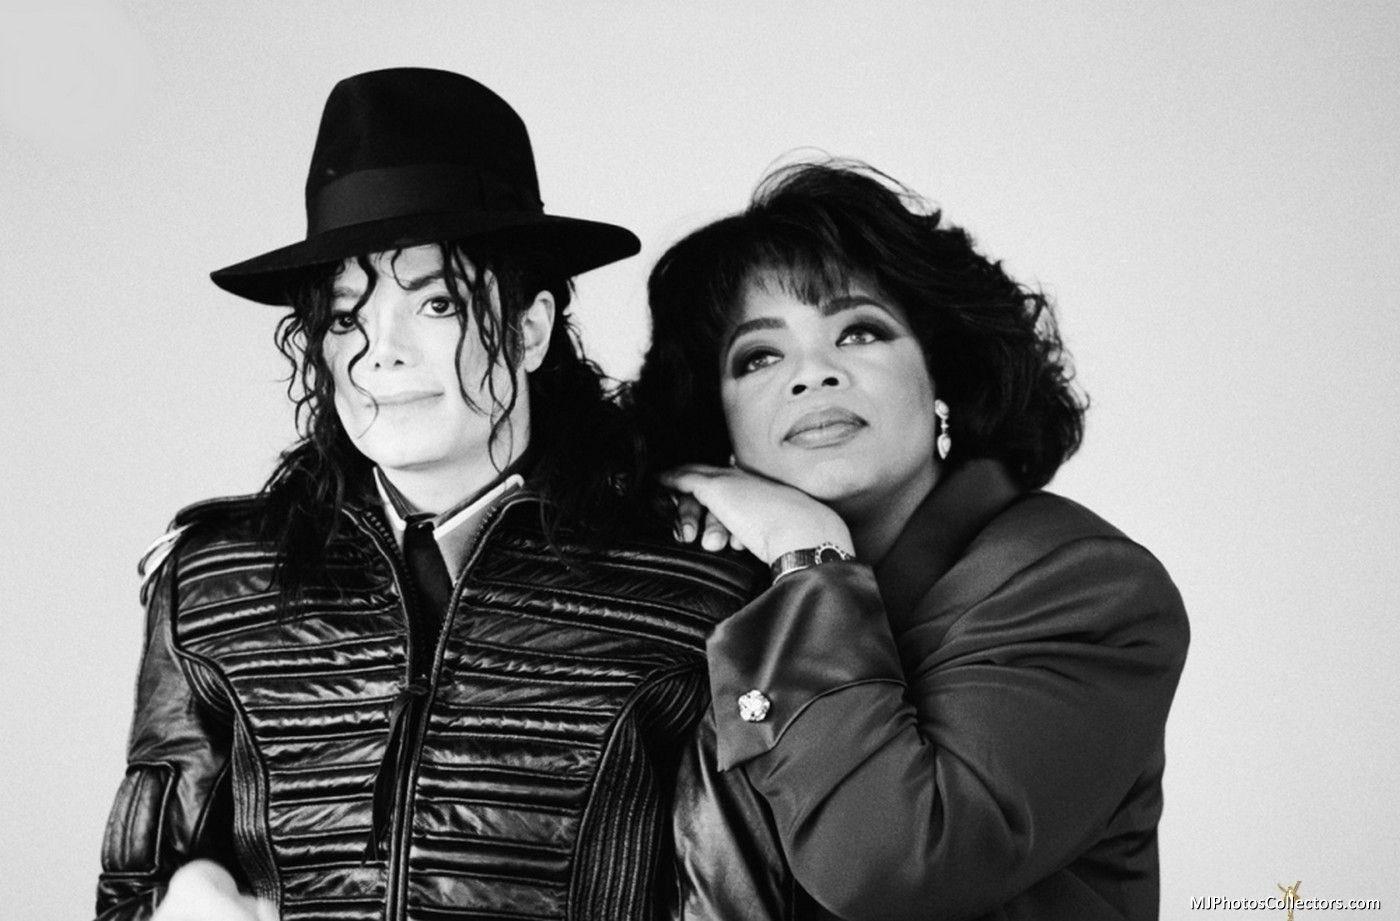 Michael-jackson-s-family